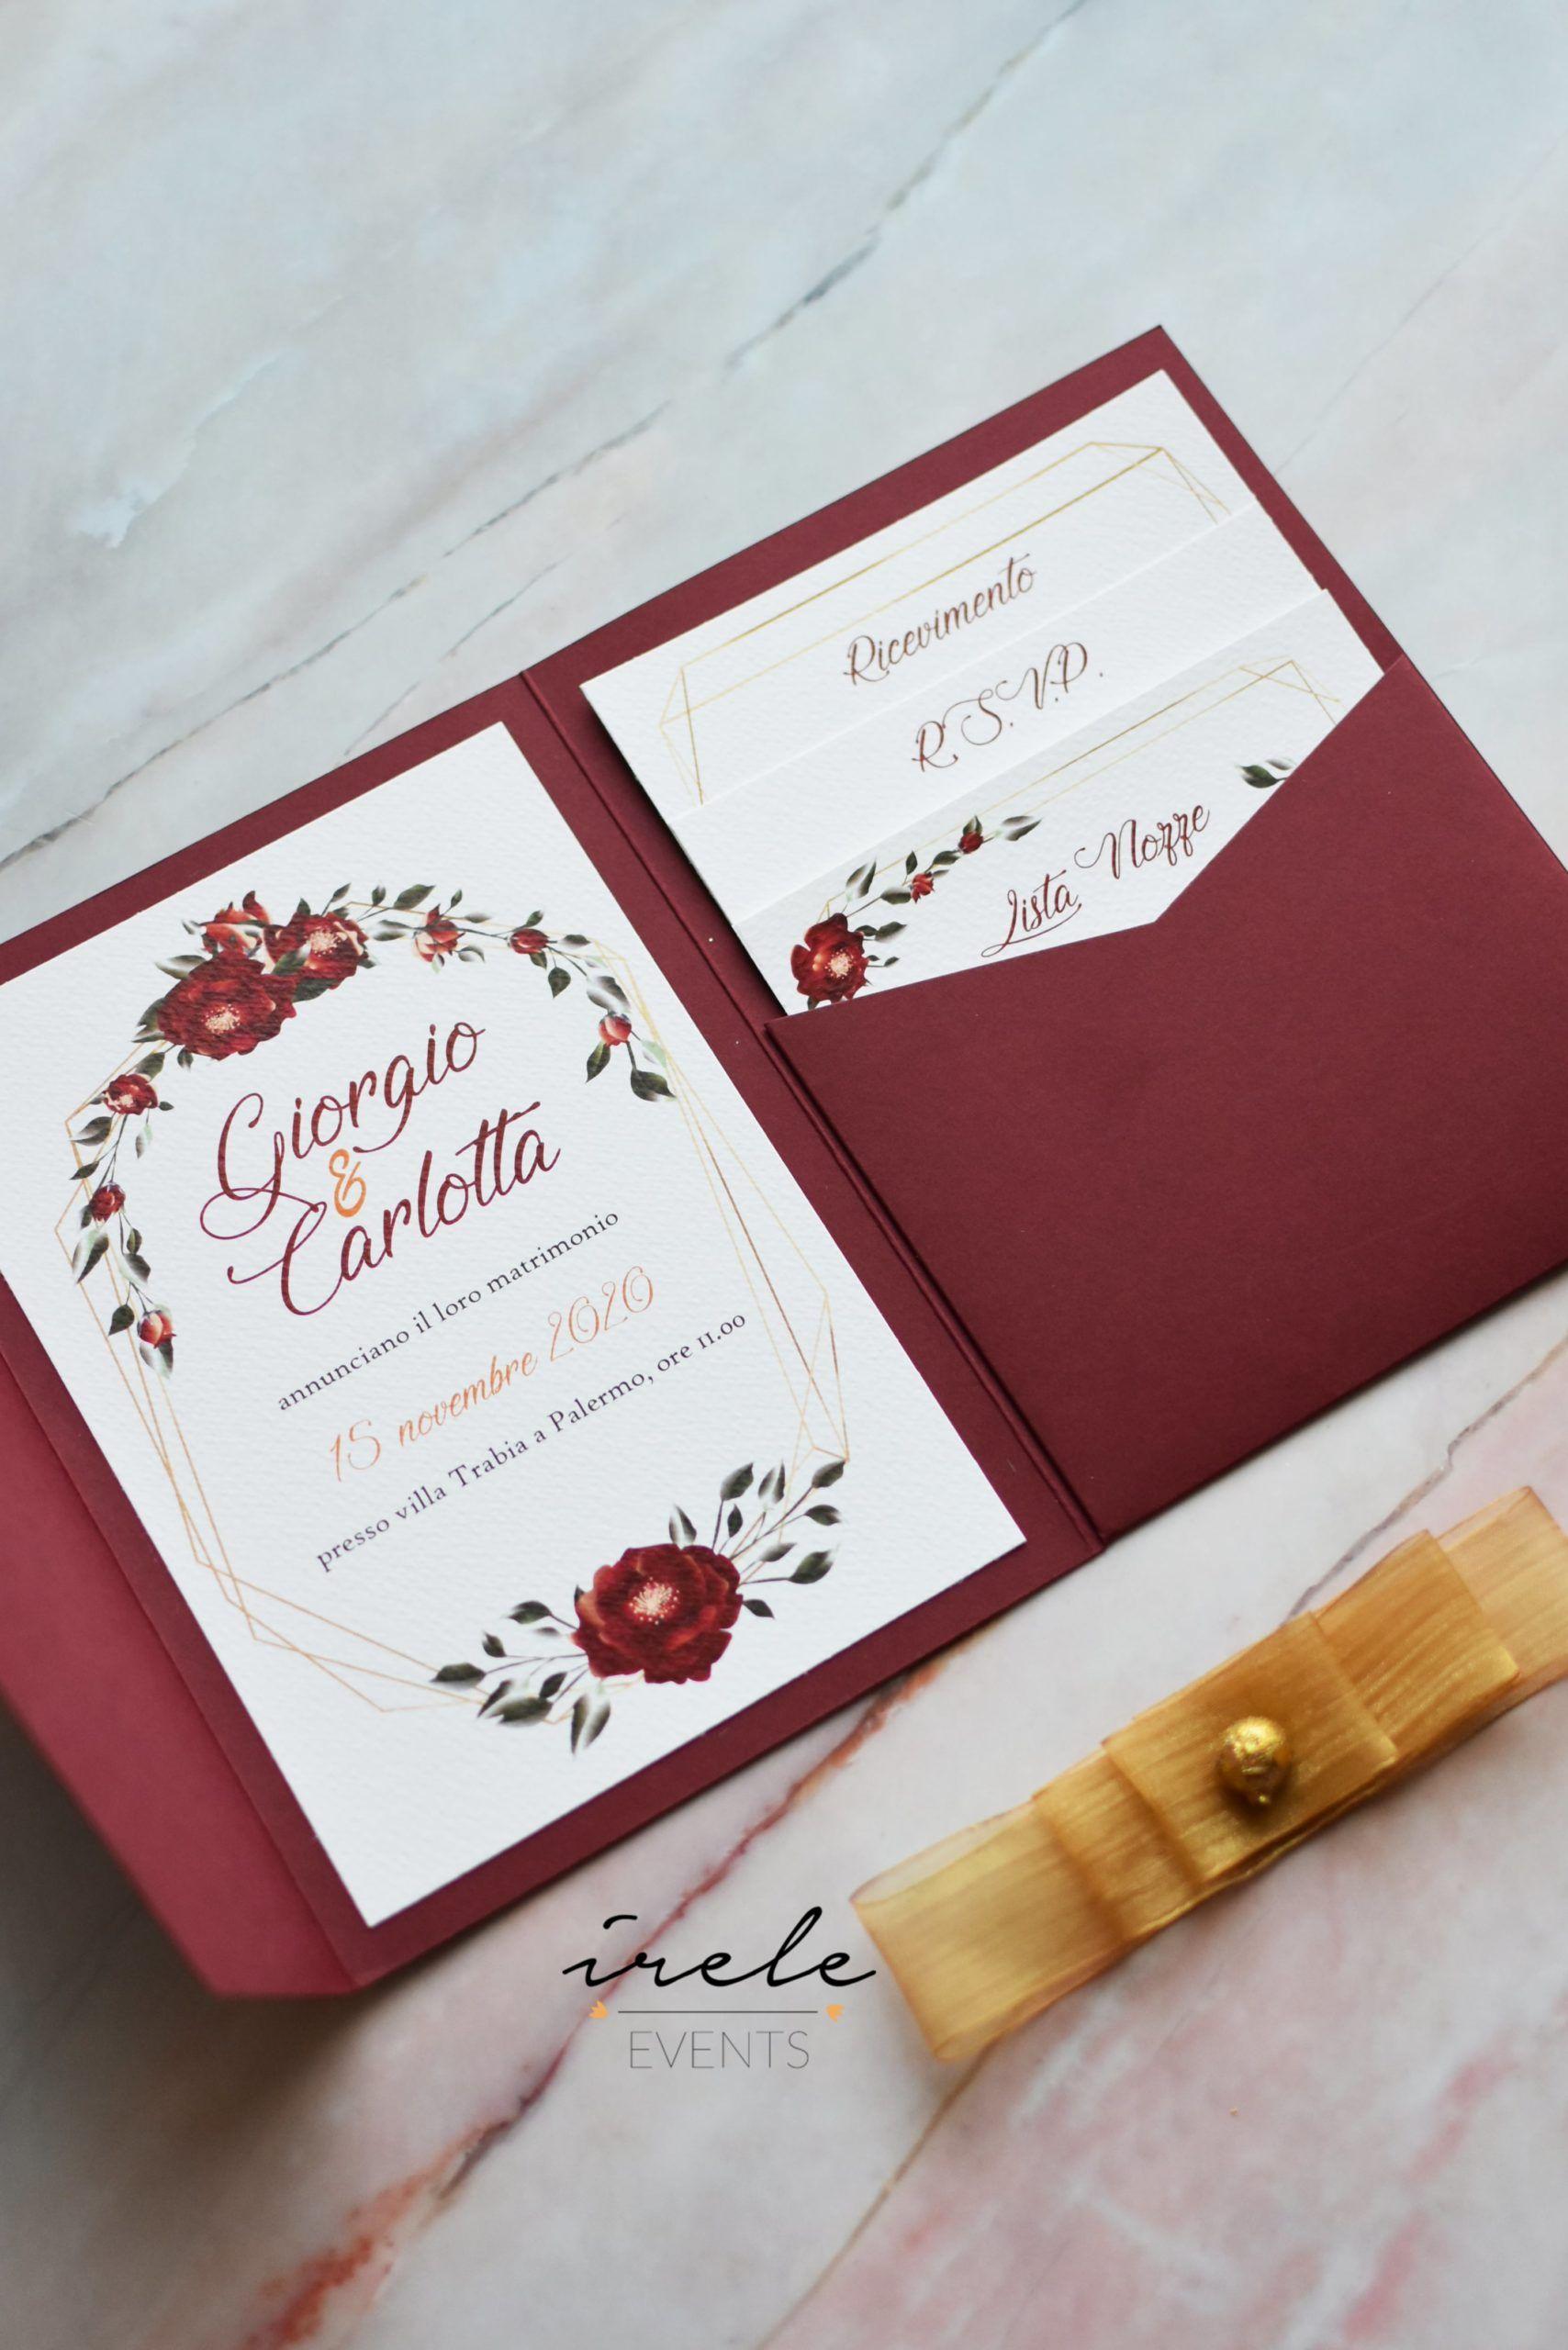 Partecipazioni Matrimonio Nozze Burgundy Borgogna Rose Nel 2020 Partecipazioni Per Matrimonio Inviti Di Nozze Originali Nozze